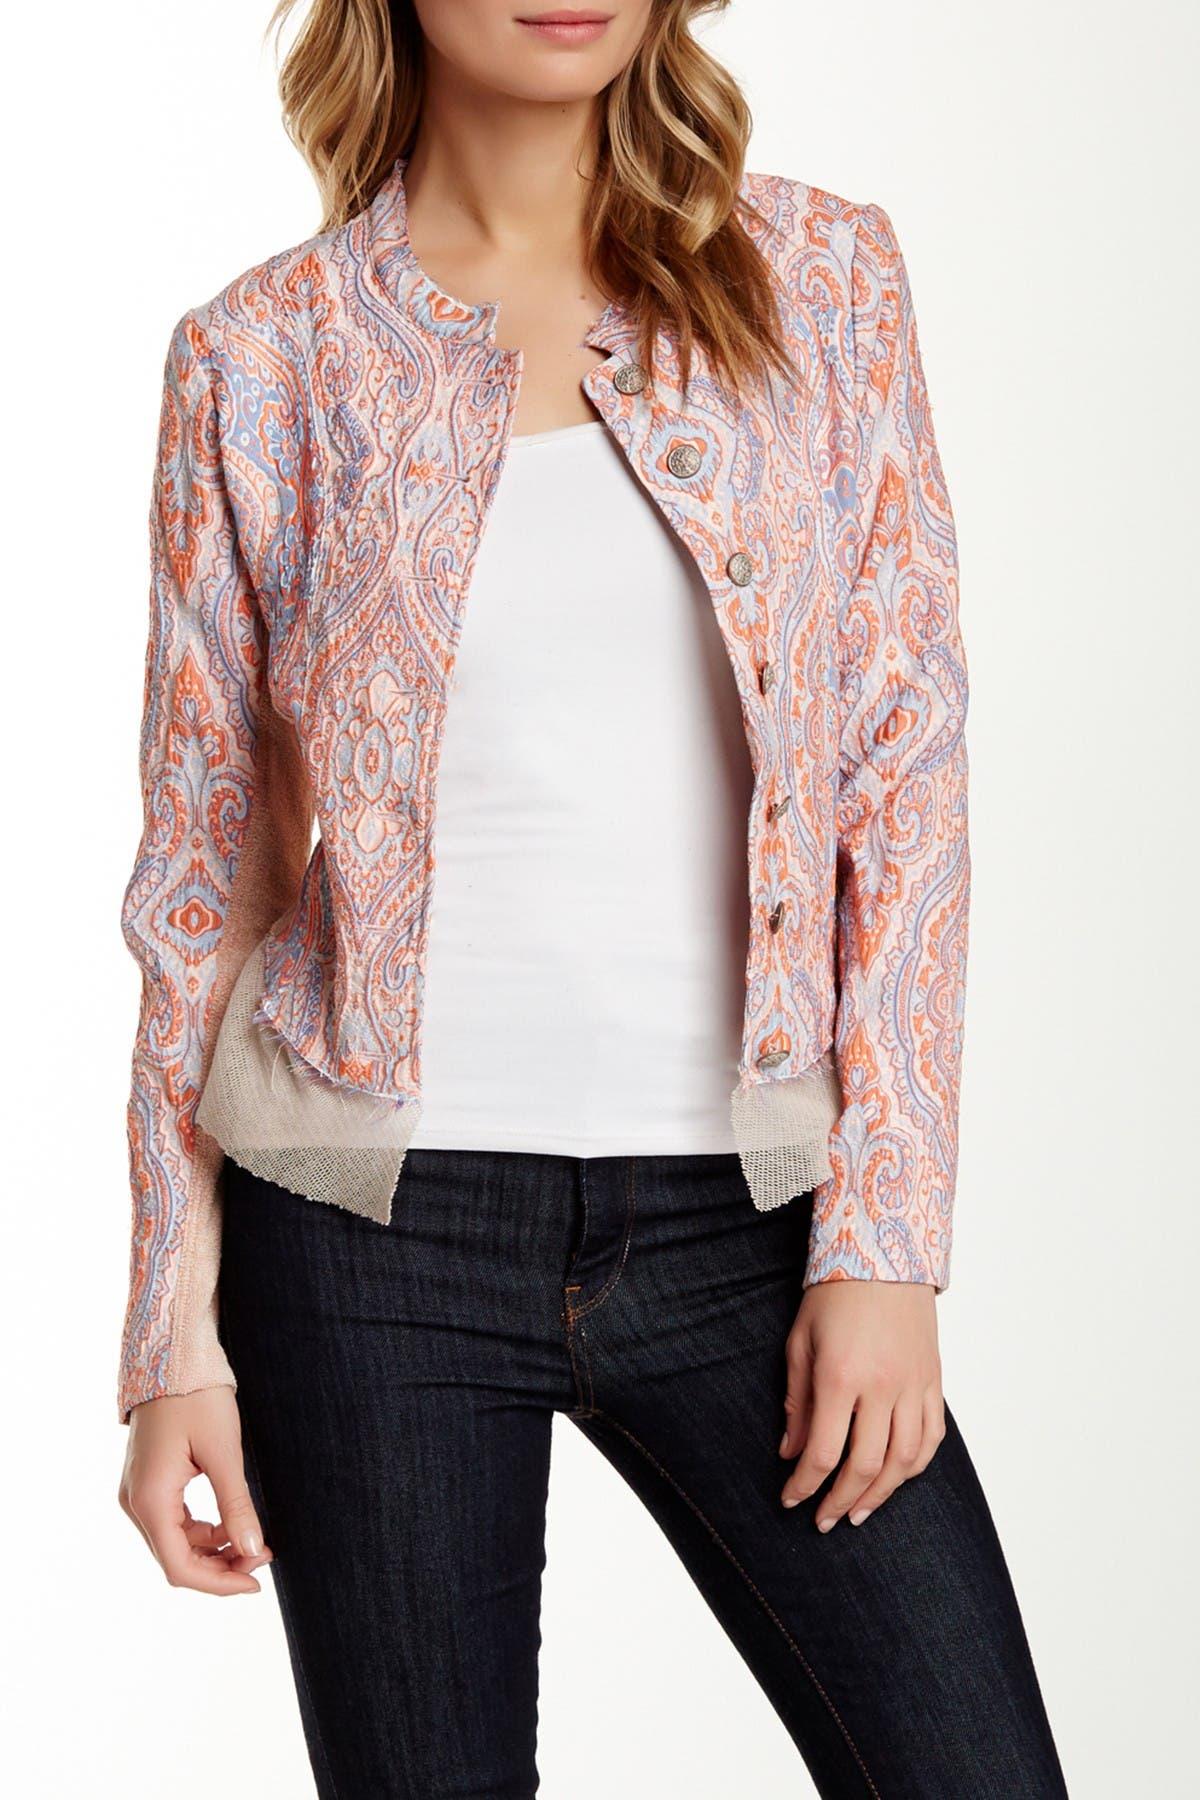 Image of ARATTA Sweet Memories Jacket